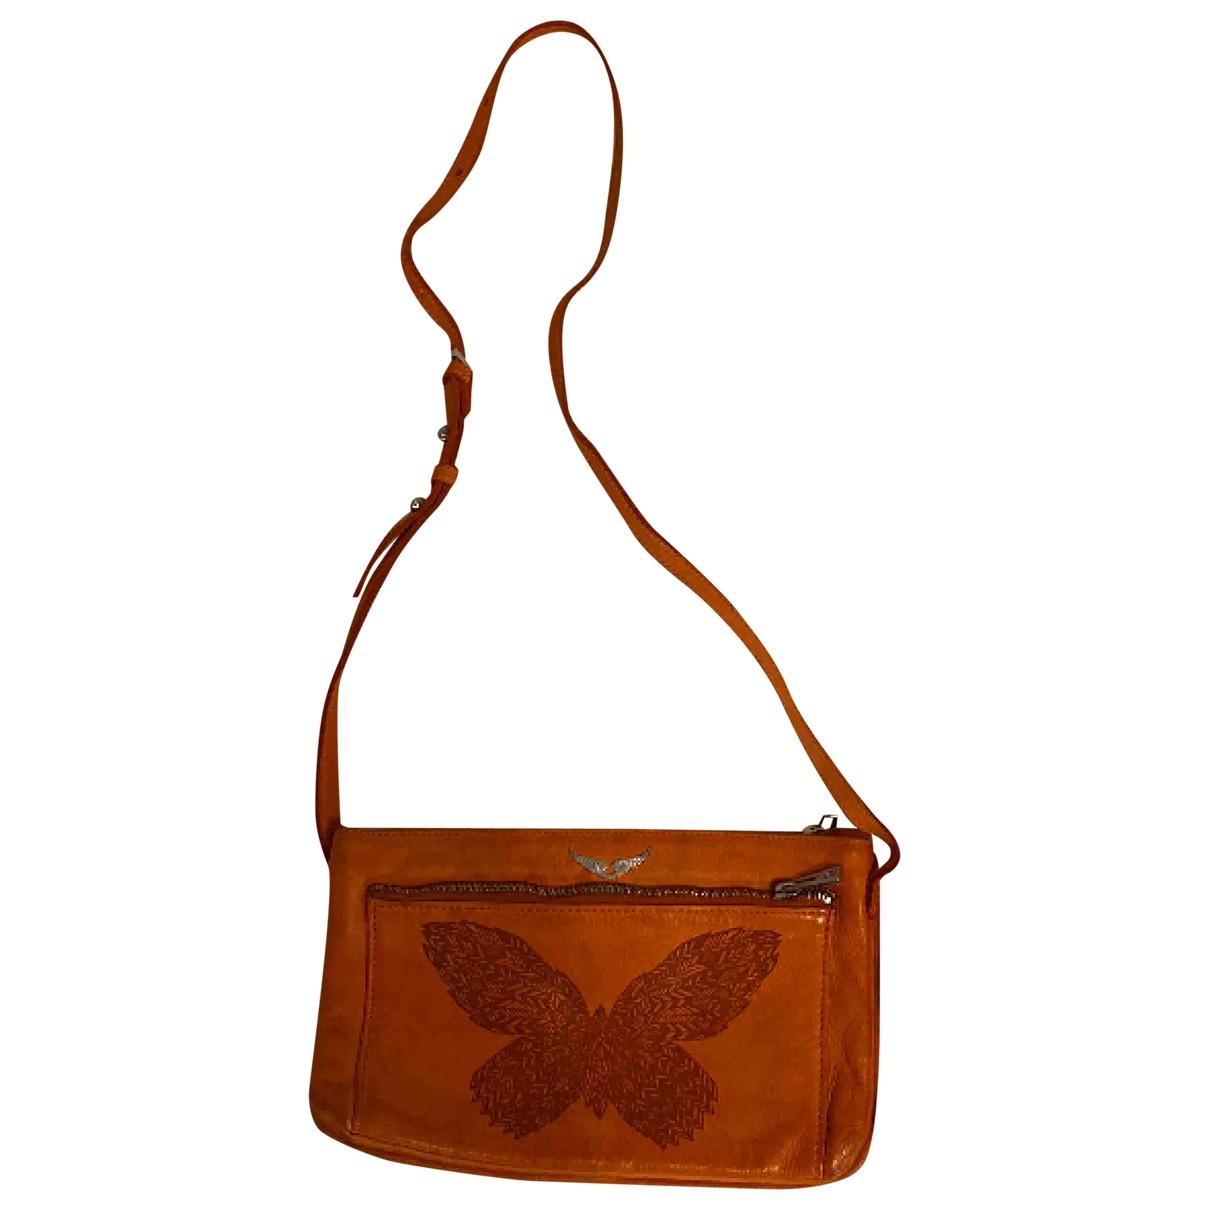 Zadig & Voltaire \N Orange Leather handbag for Women \N